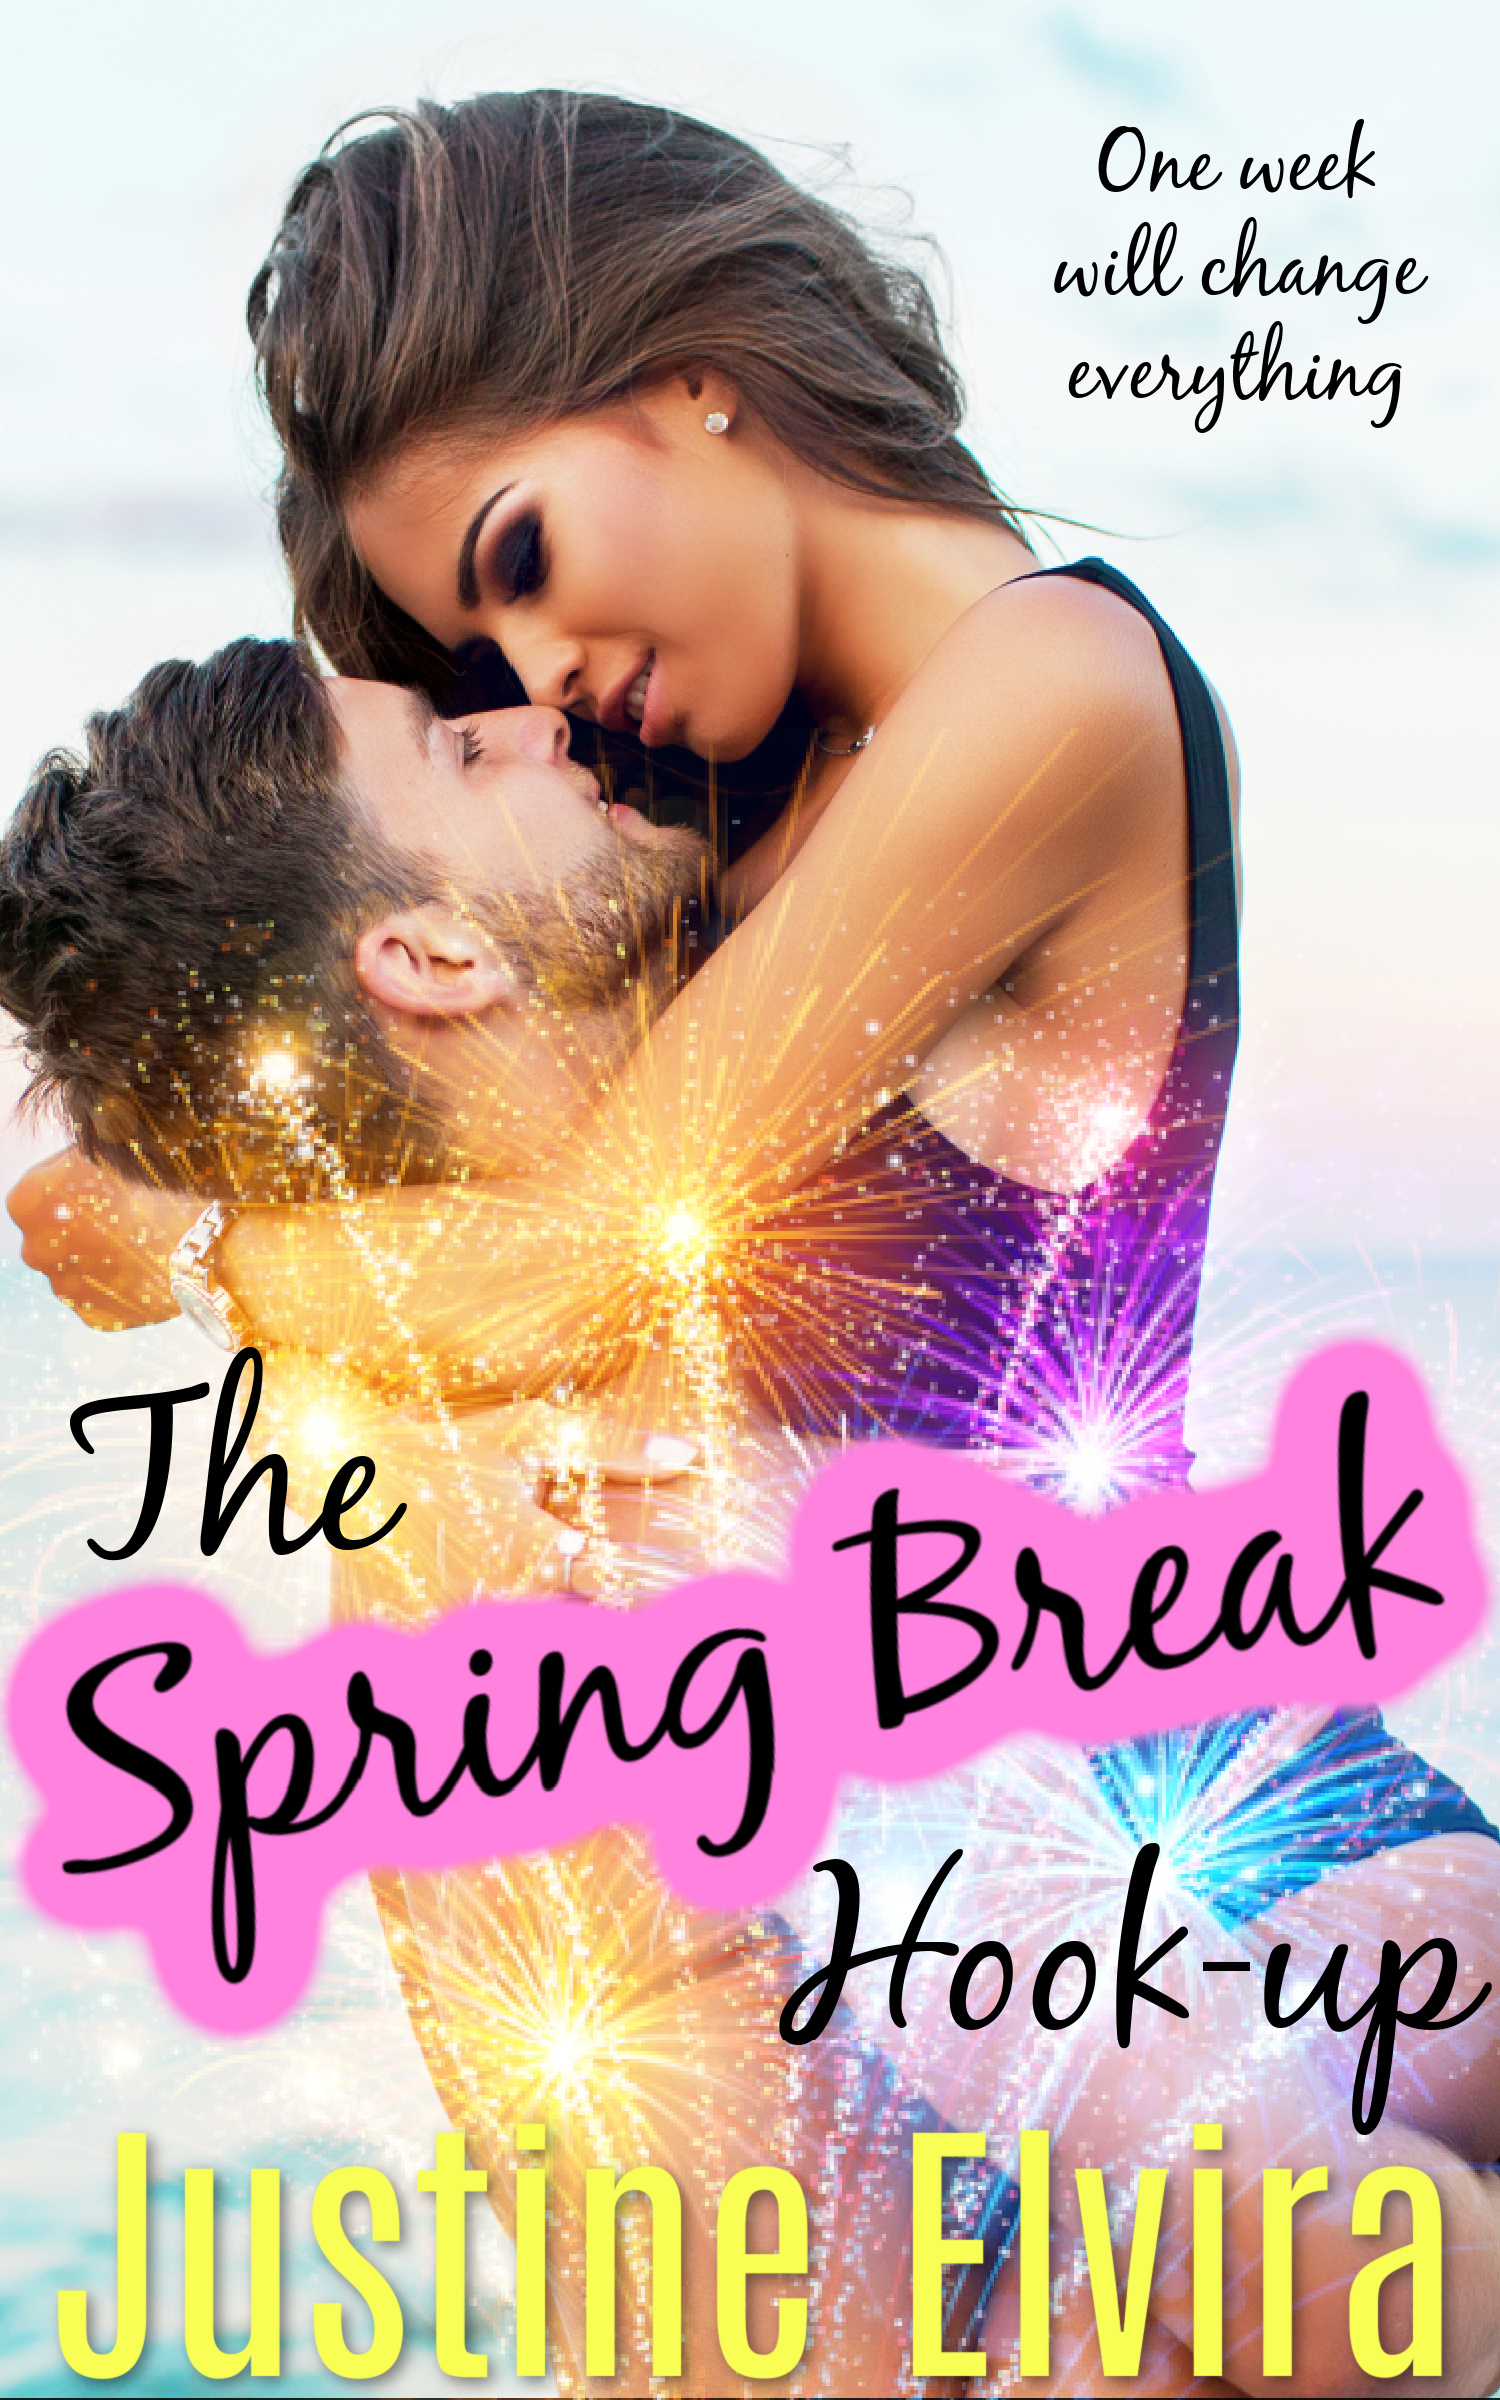 The Spring Break Hook-up